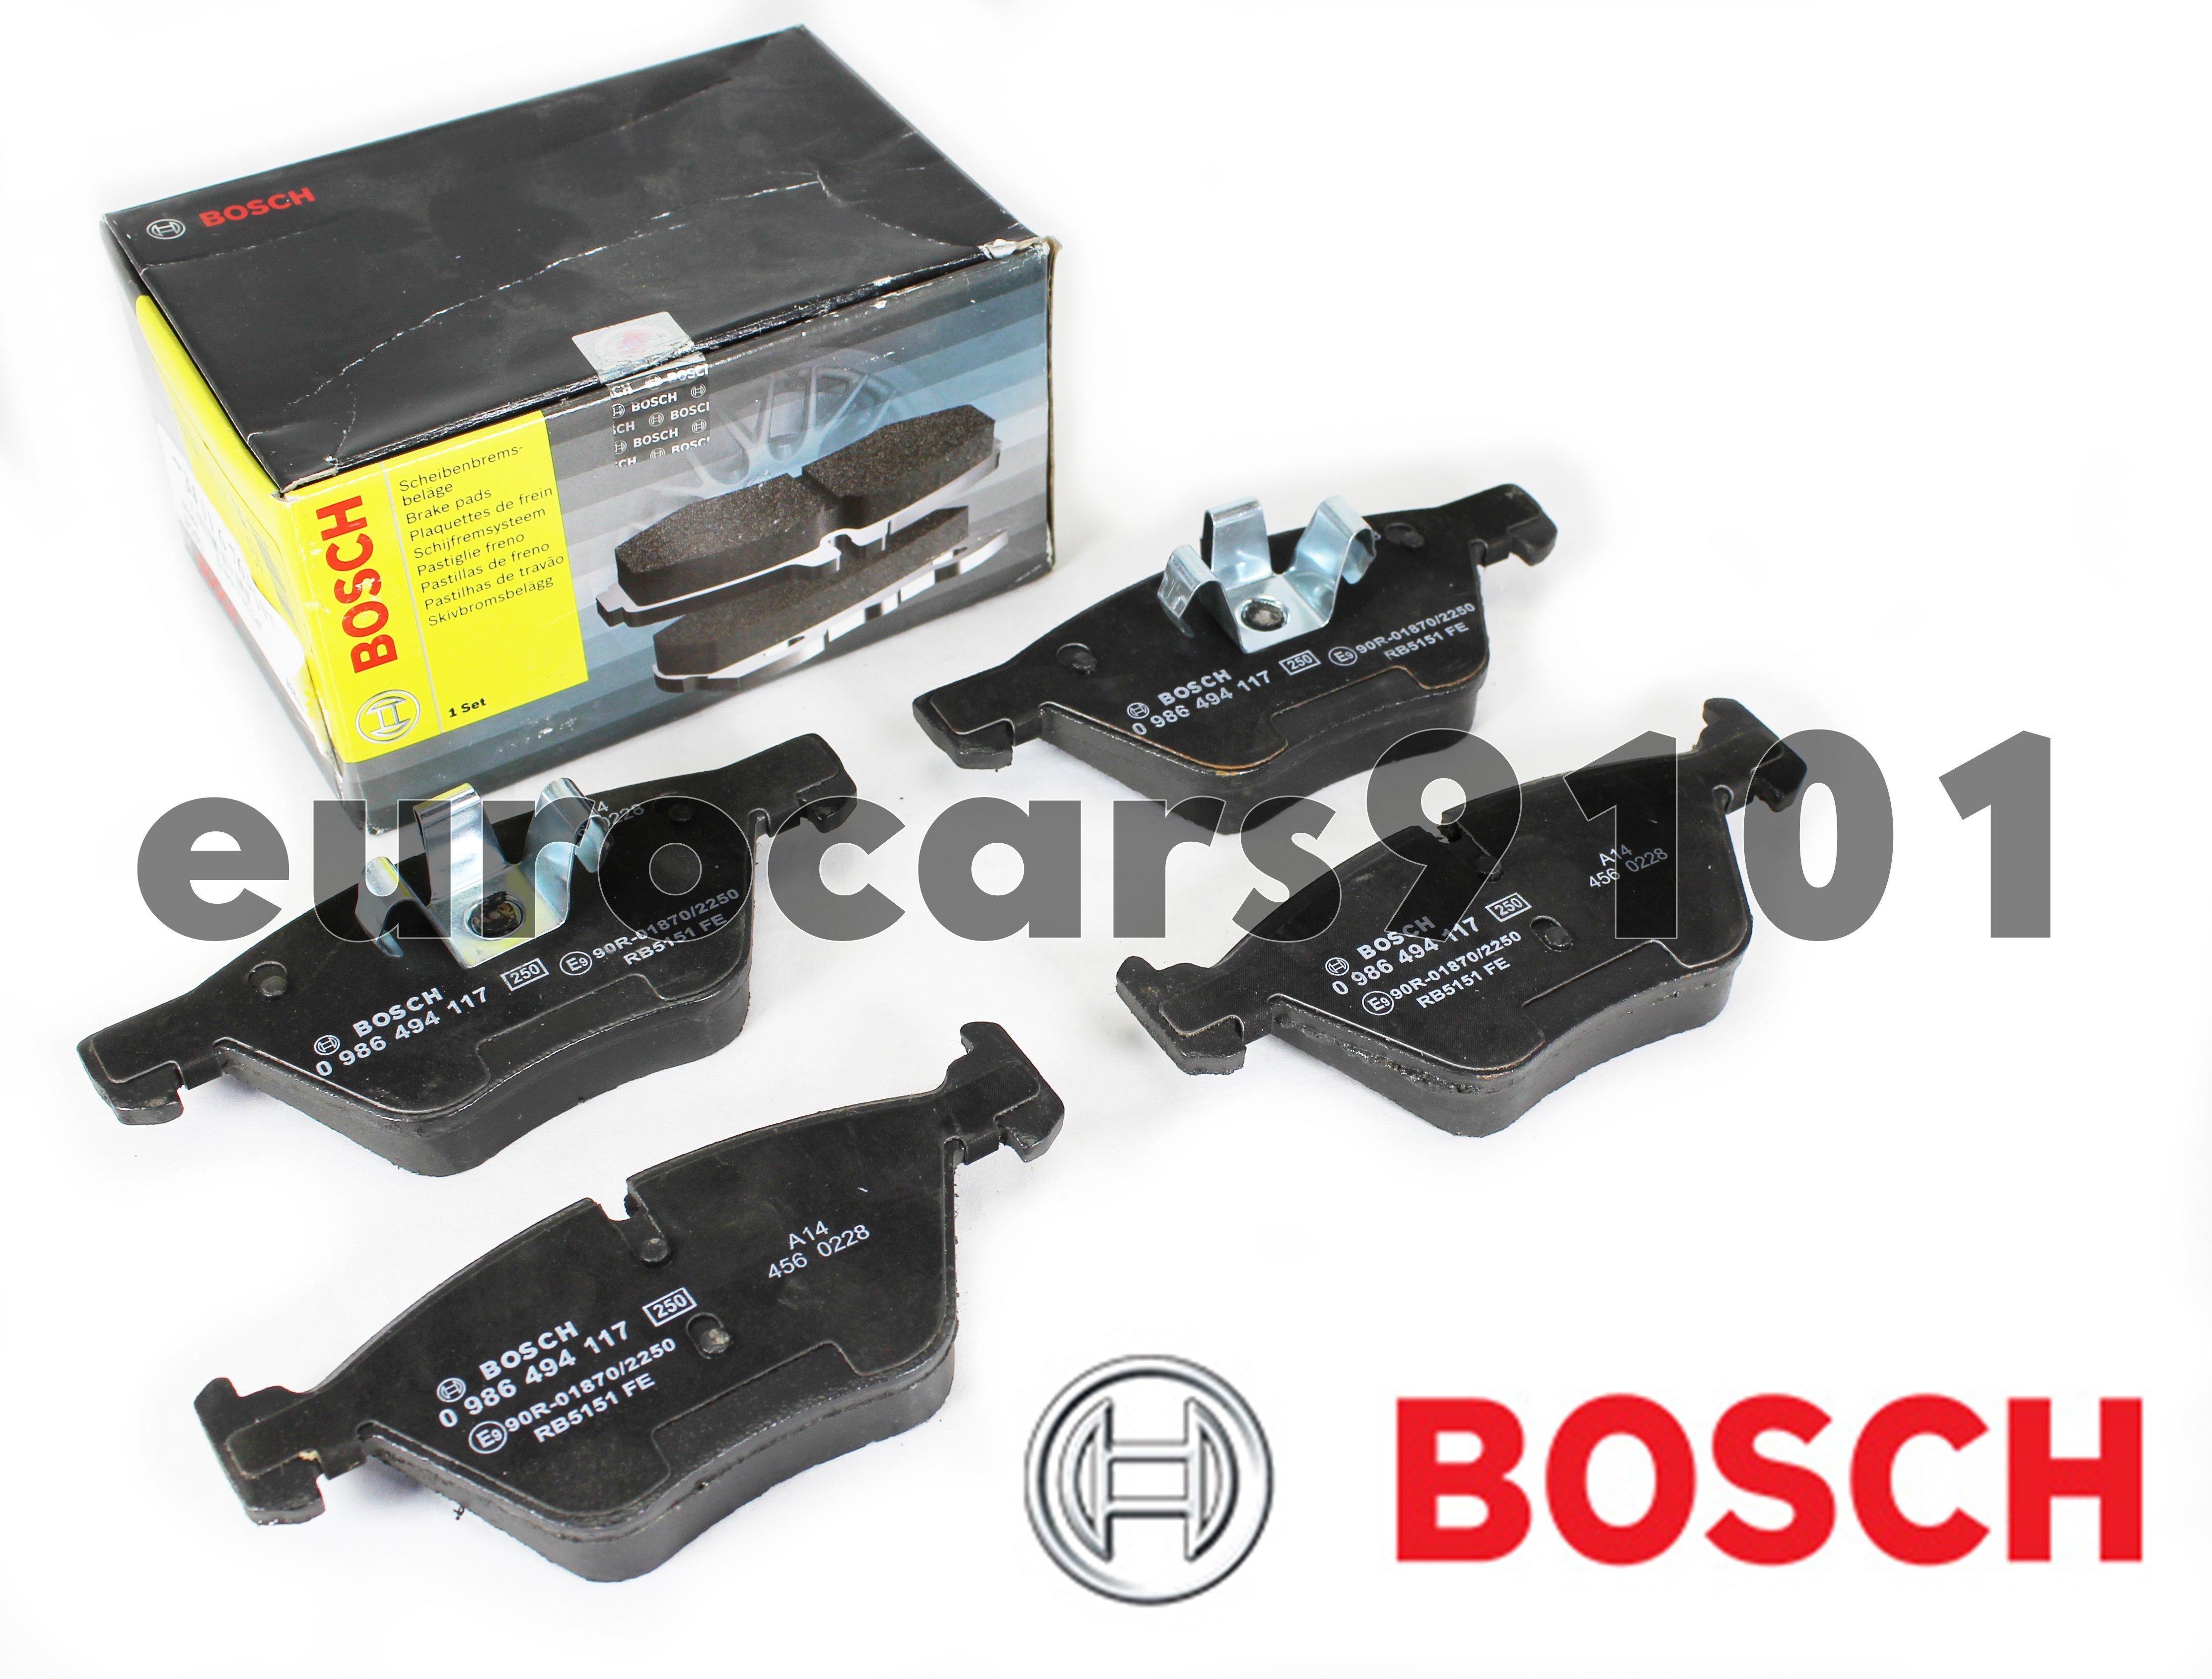 NEW 103.06831 COMPLETE SET REAR BRAKE PAD CENTRIC FITS BMW 525XI 530I 525I 528I